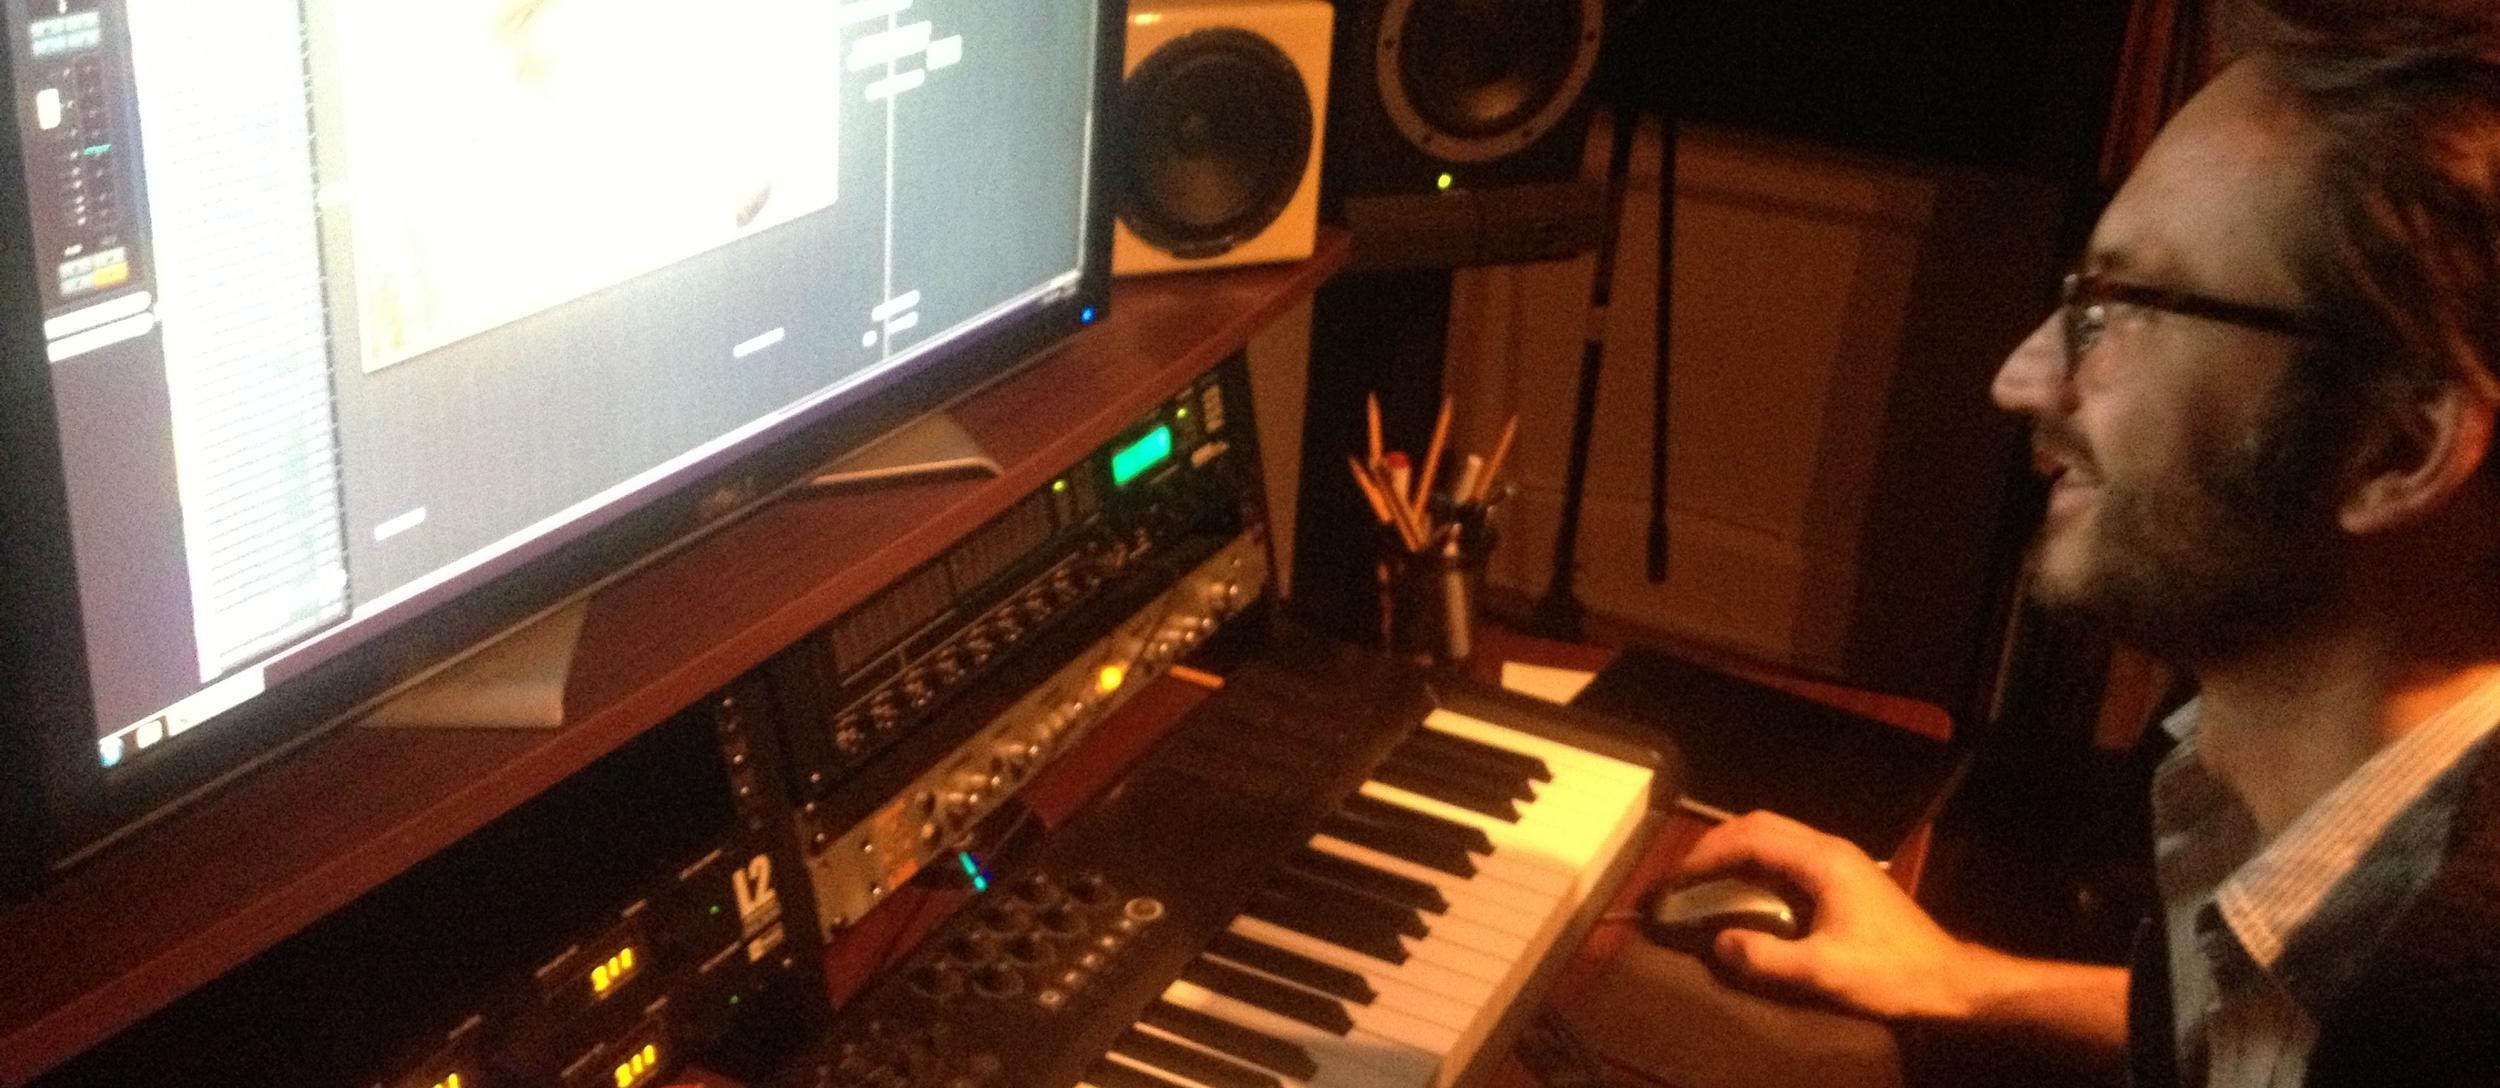 The talented Fatrin Krajka on his magic keyboard.